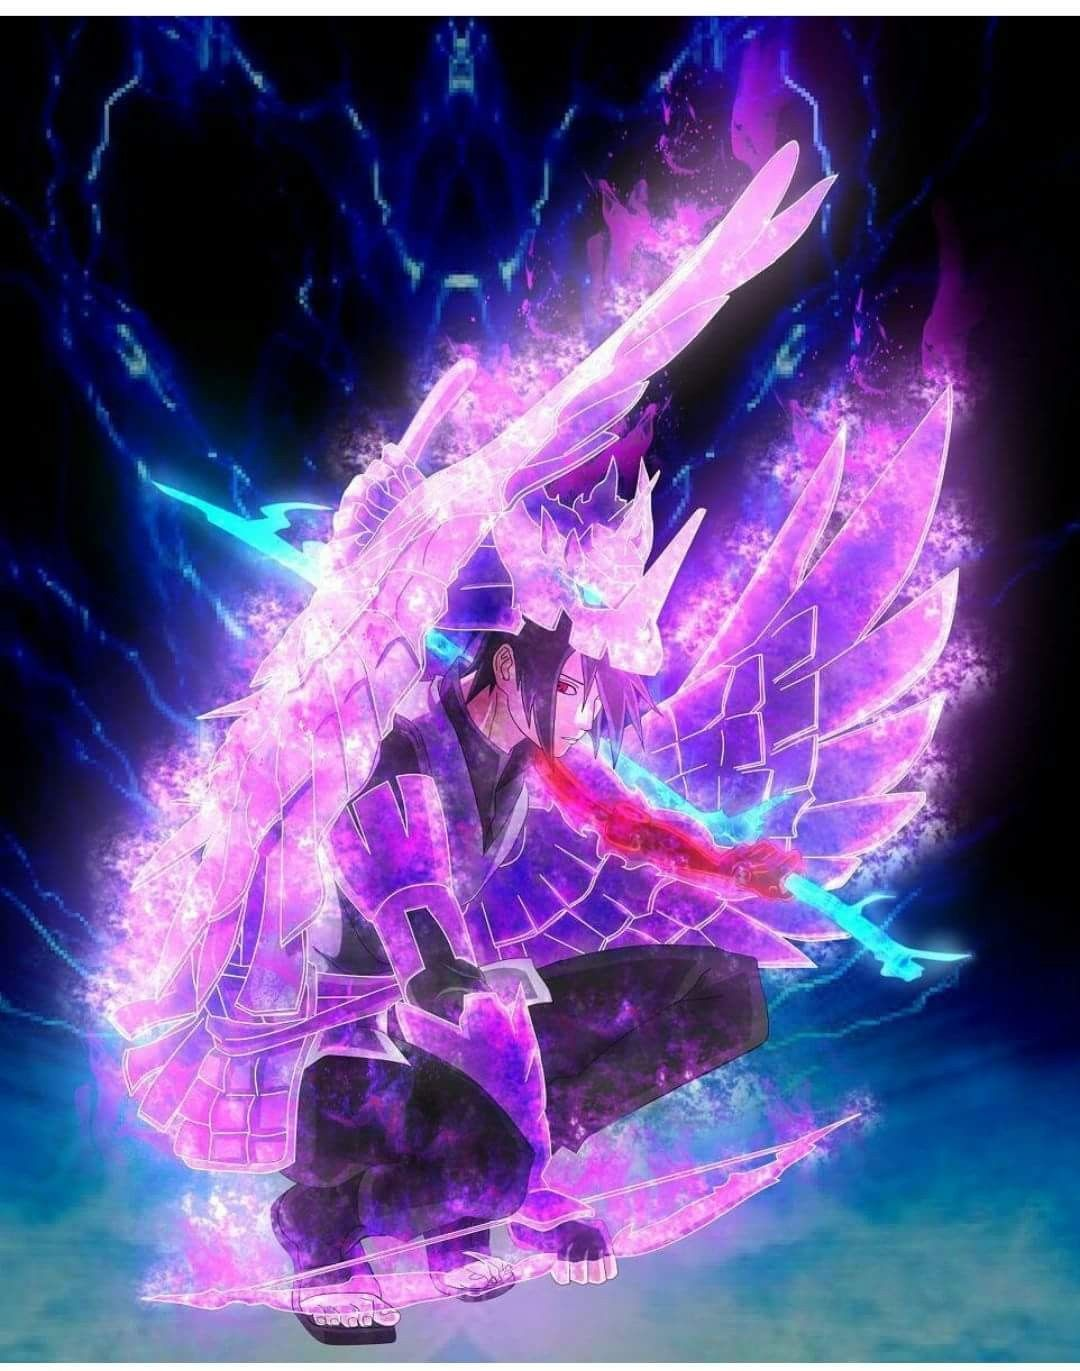 Sasuke Uchiha Wallpaper ️ #Susanoo #Protector #Sharingan # ...